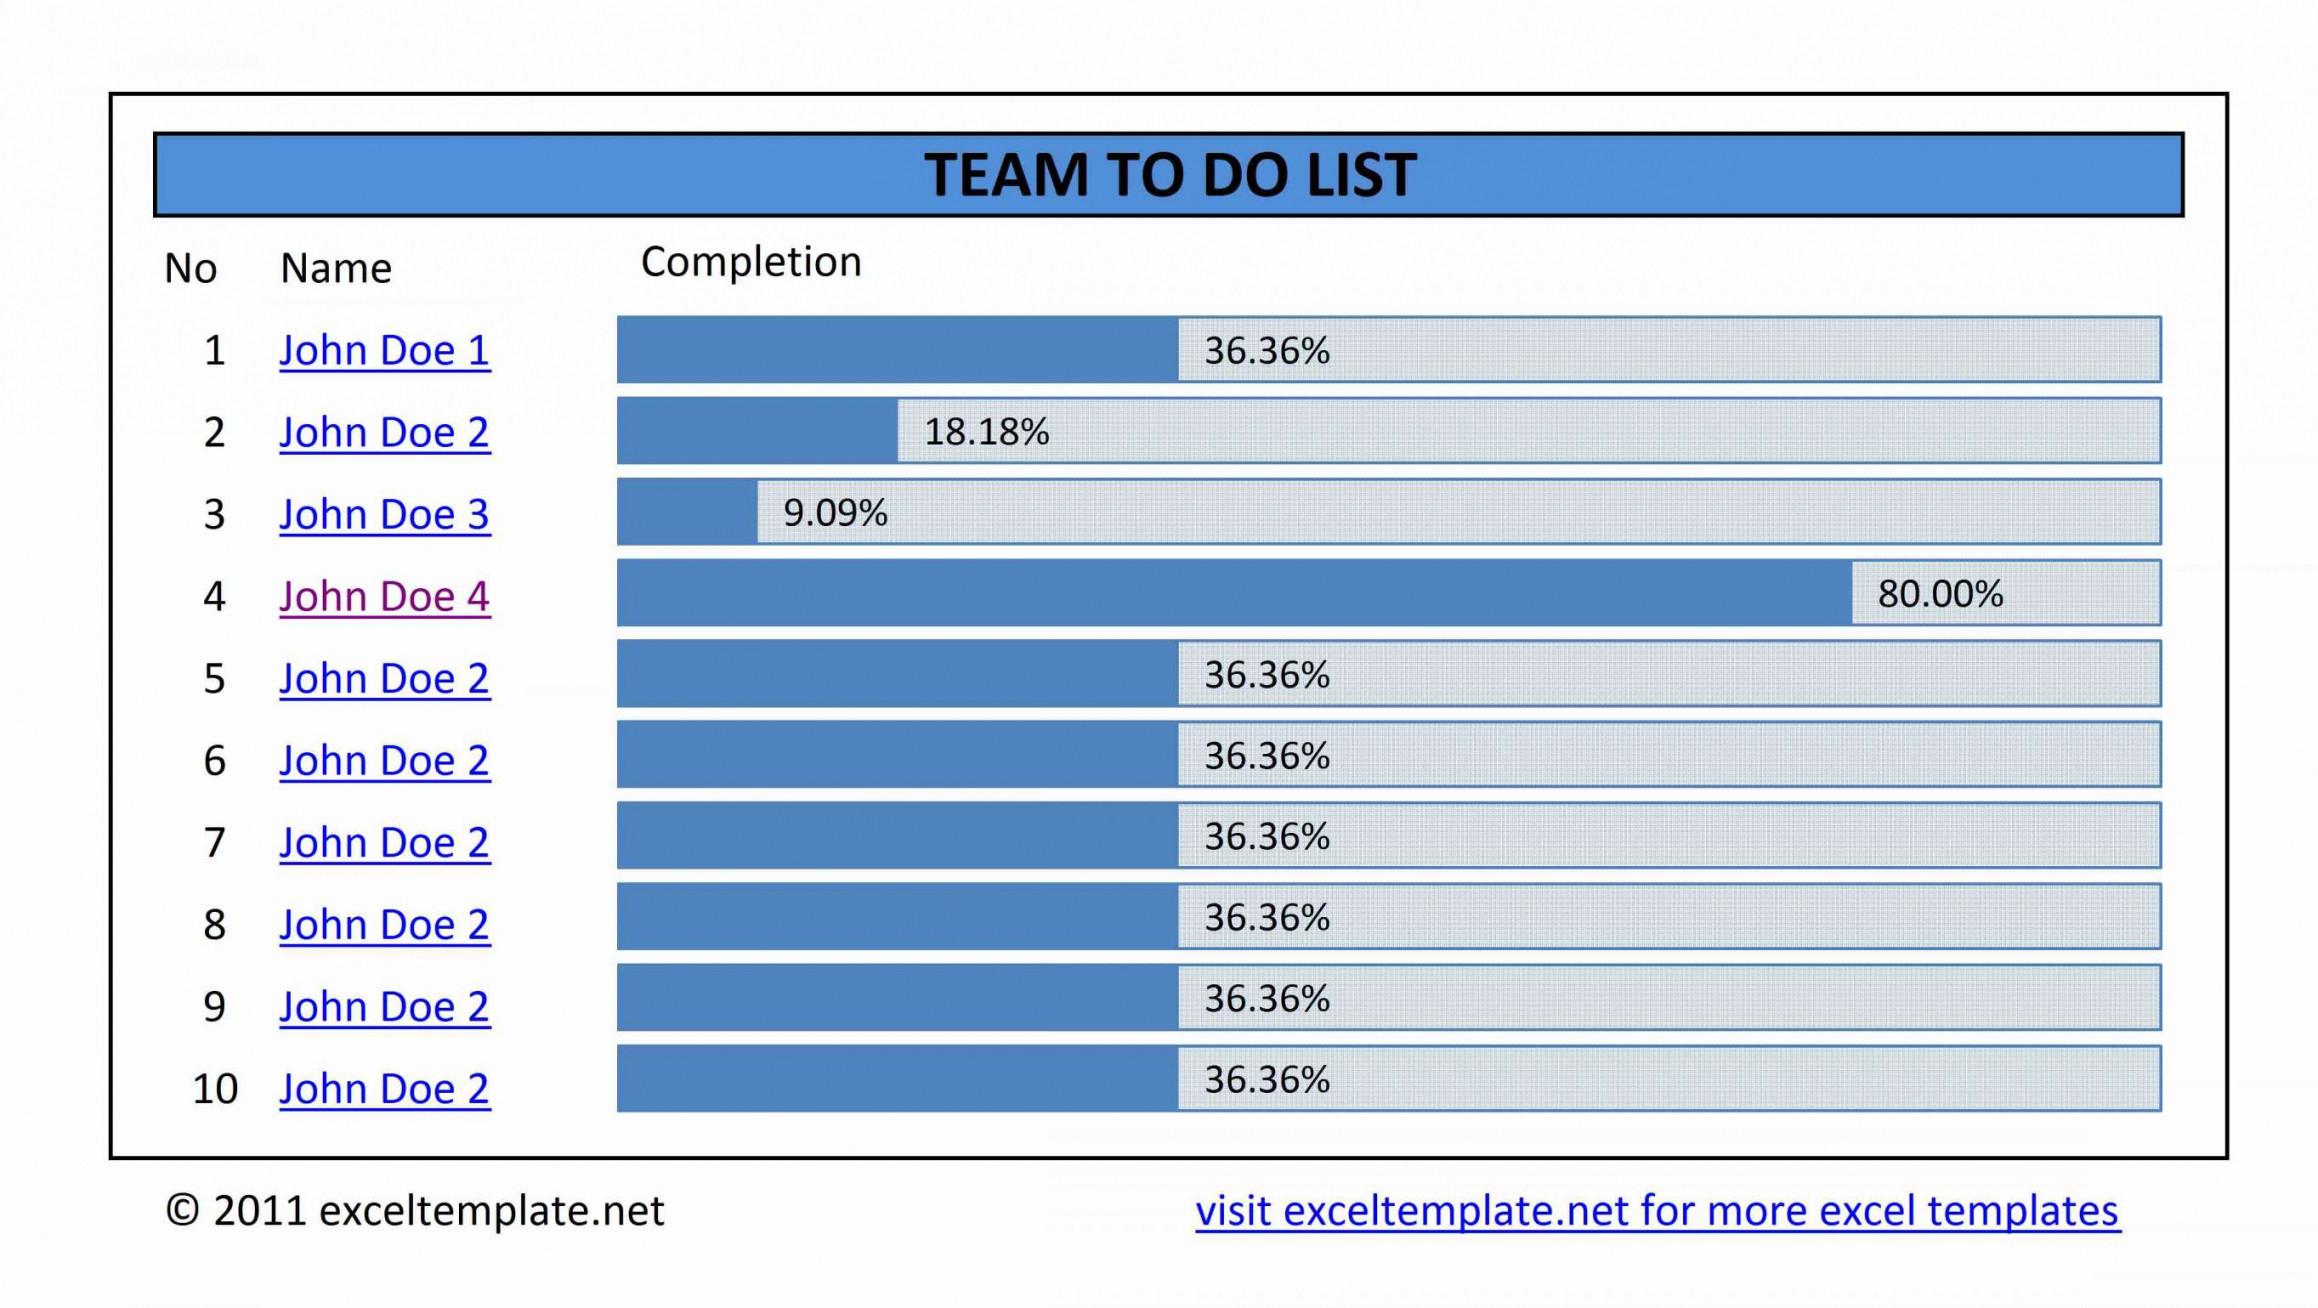 Excel Spreadsheet Task List Template In Task List Template Excel Spreadsheet Best Of Worksheet Microsoft